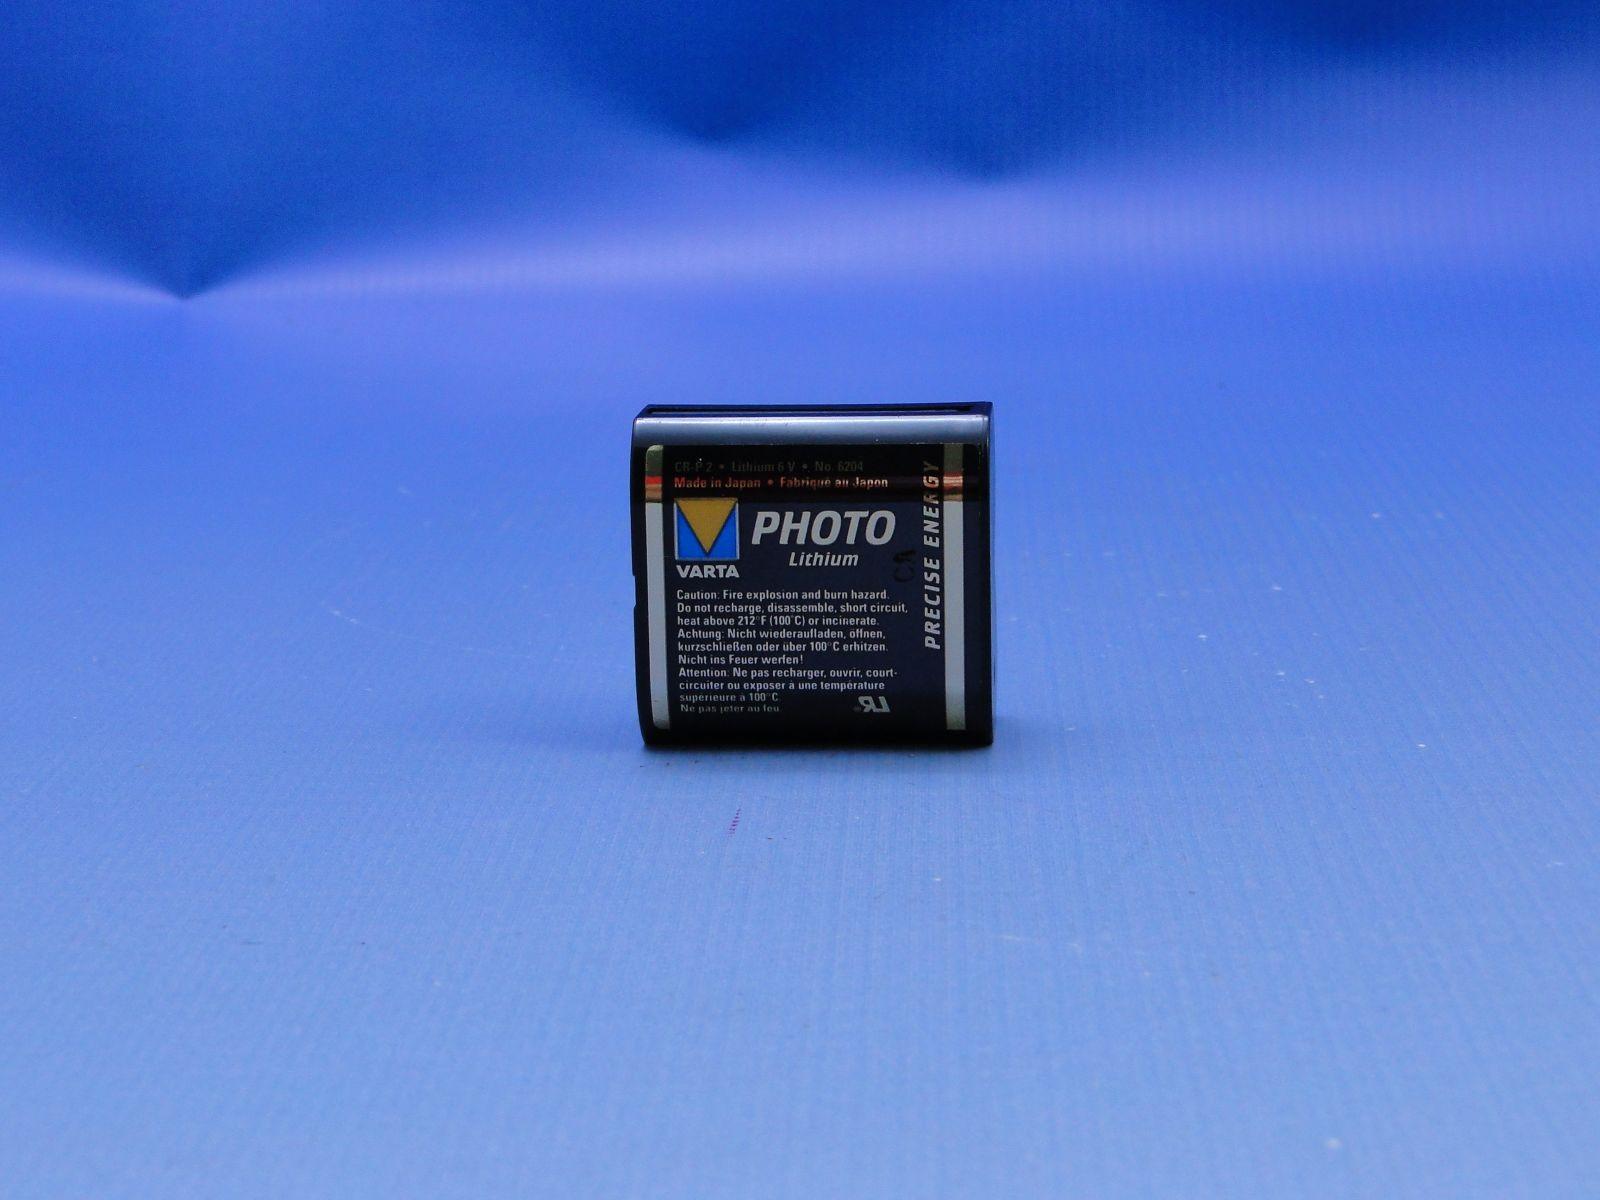 DSC03472.JPG (1600×1200)